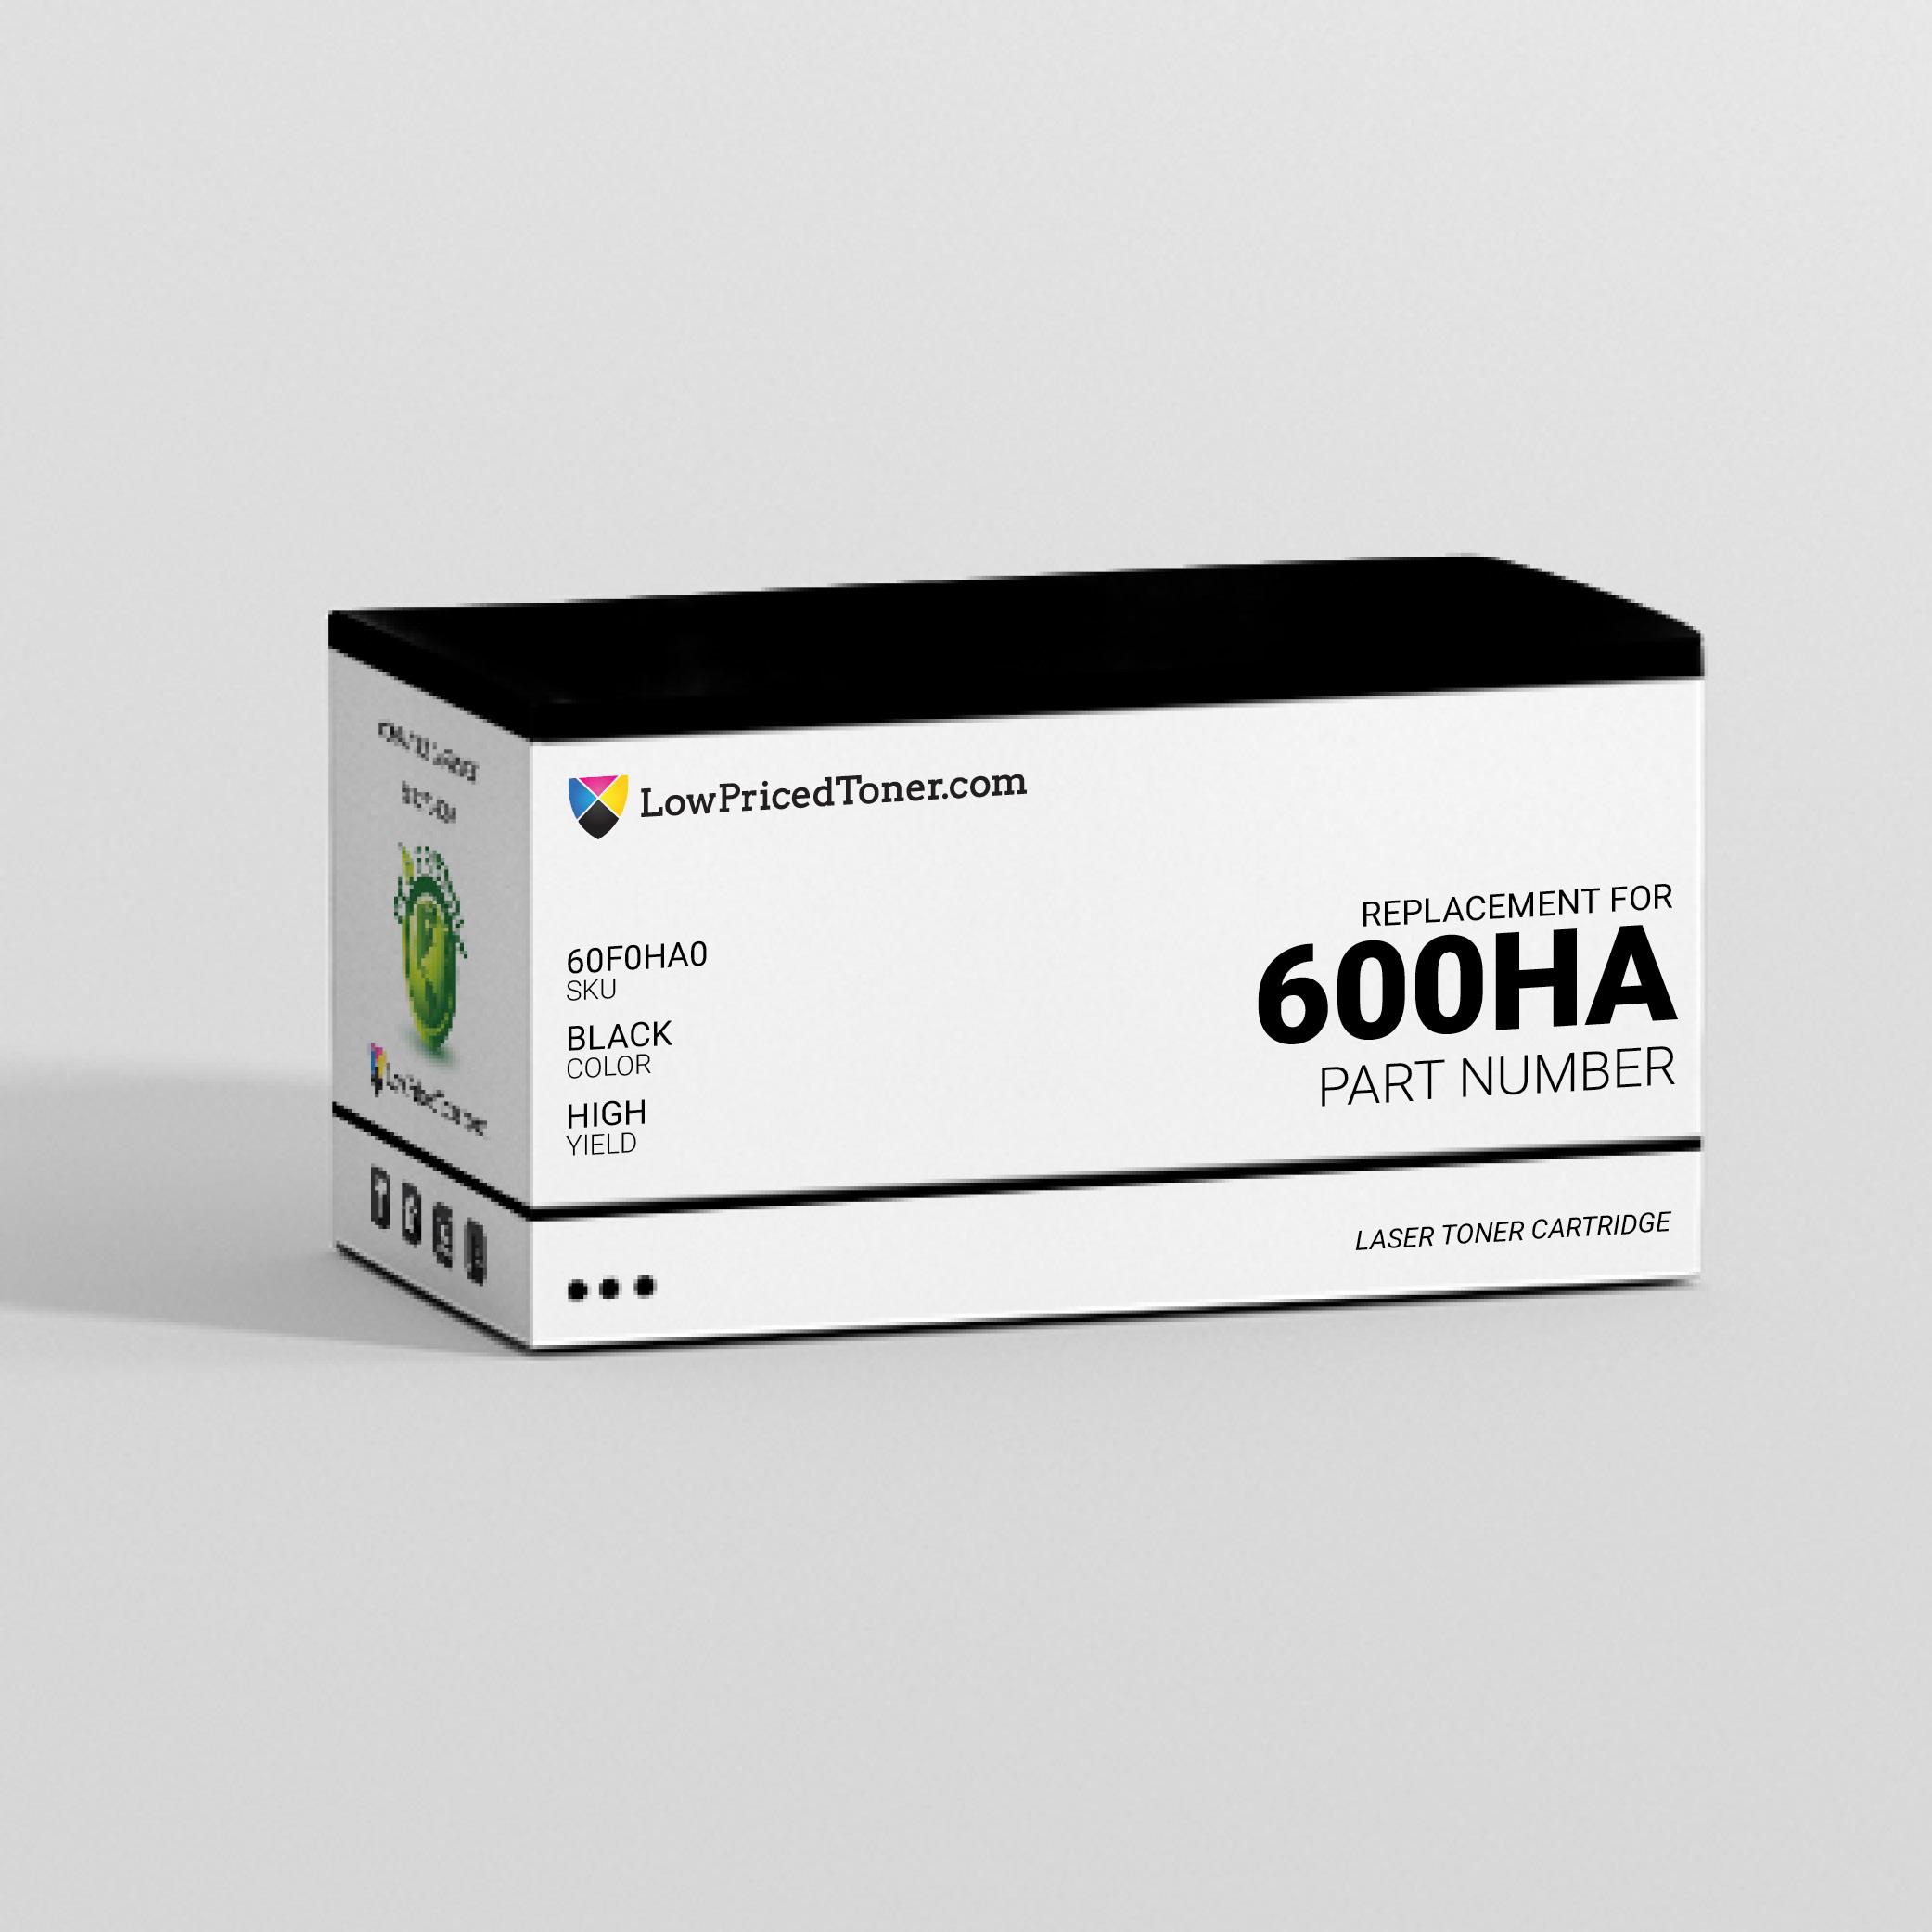 Lexmark 60F0HA0 600HA Remanufactured Black Laser Toner Cartridge High Yield